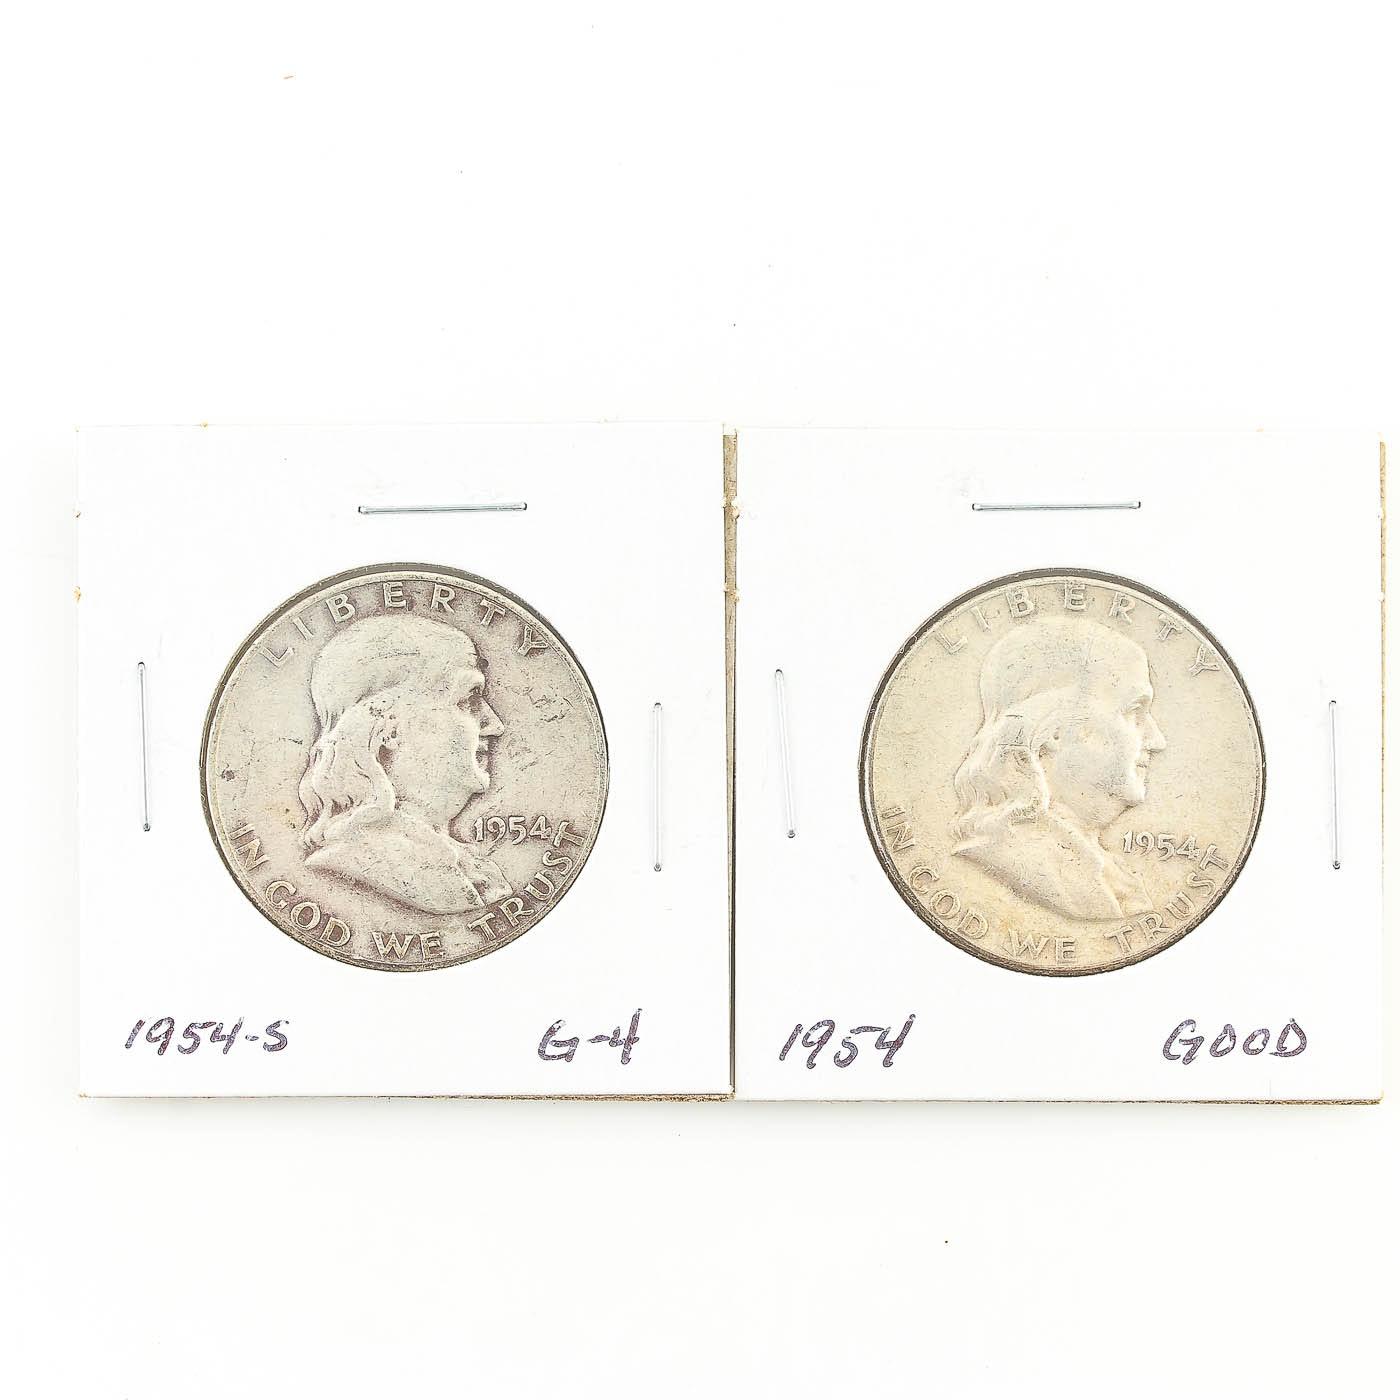 1954 and 1954-S Franklin Half Dollar